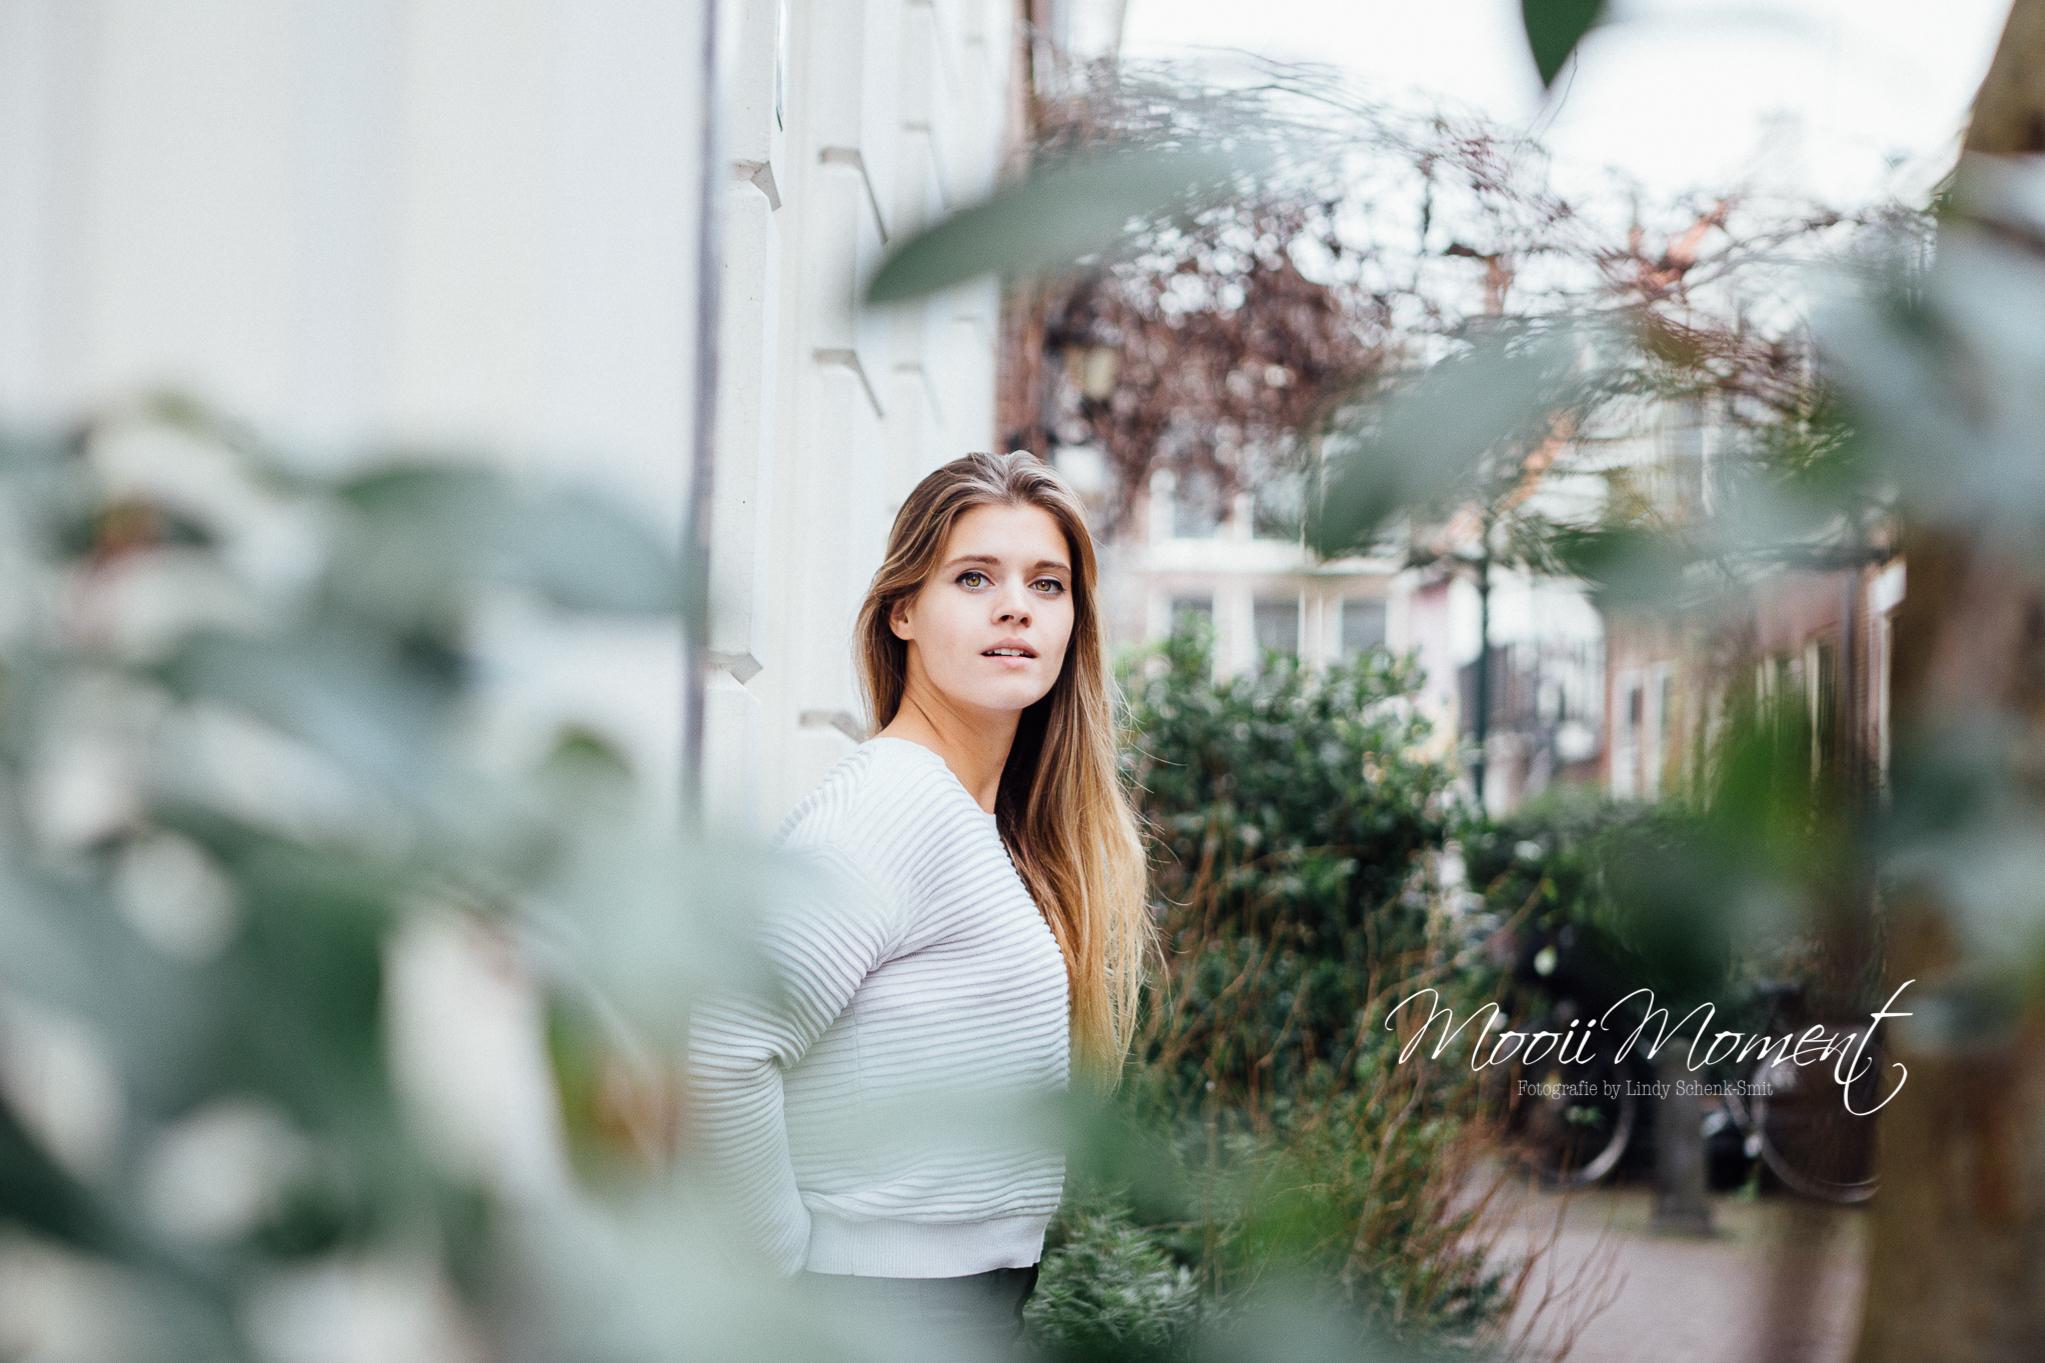 City sessie met Isa uit Limburg